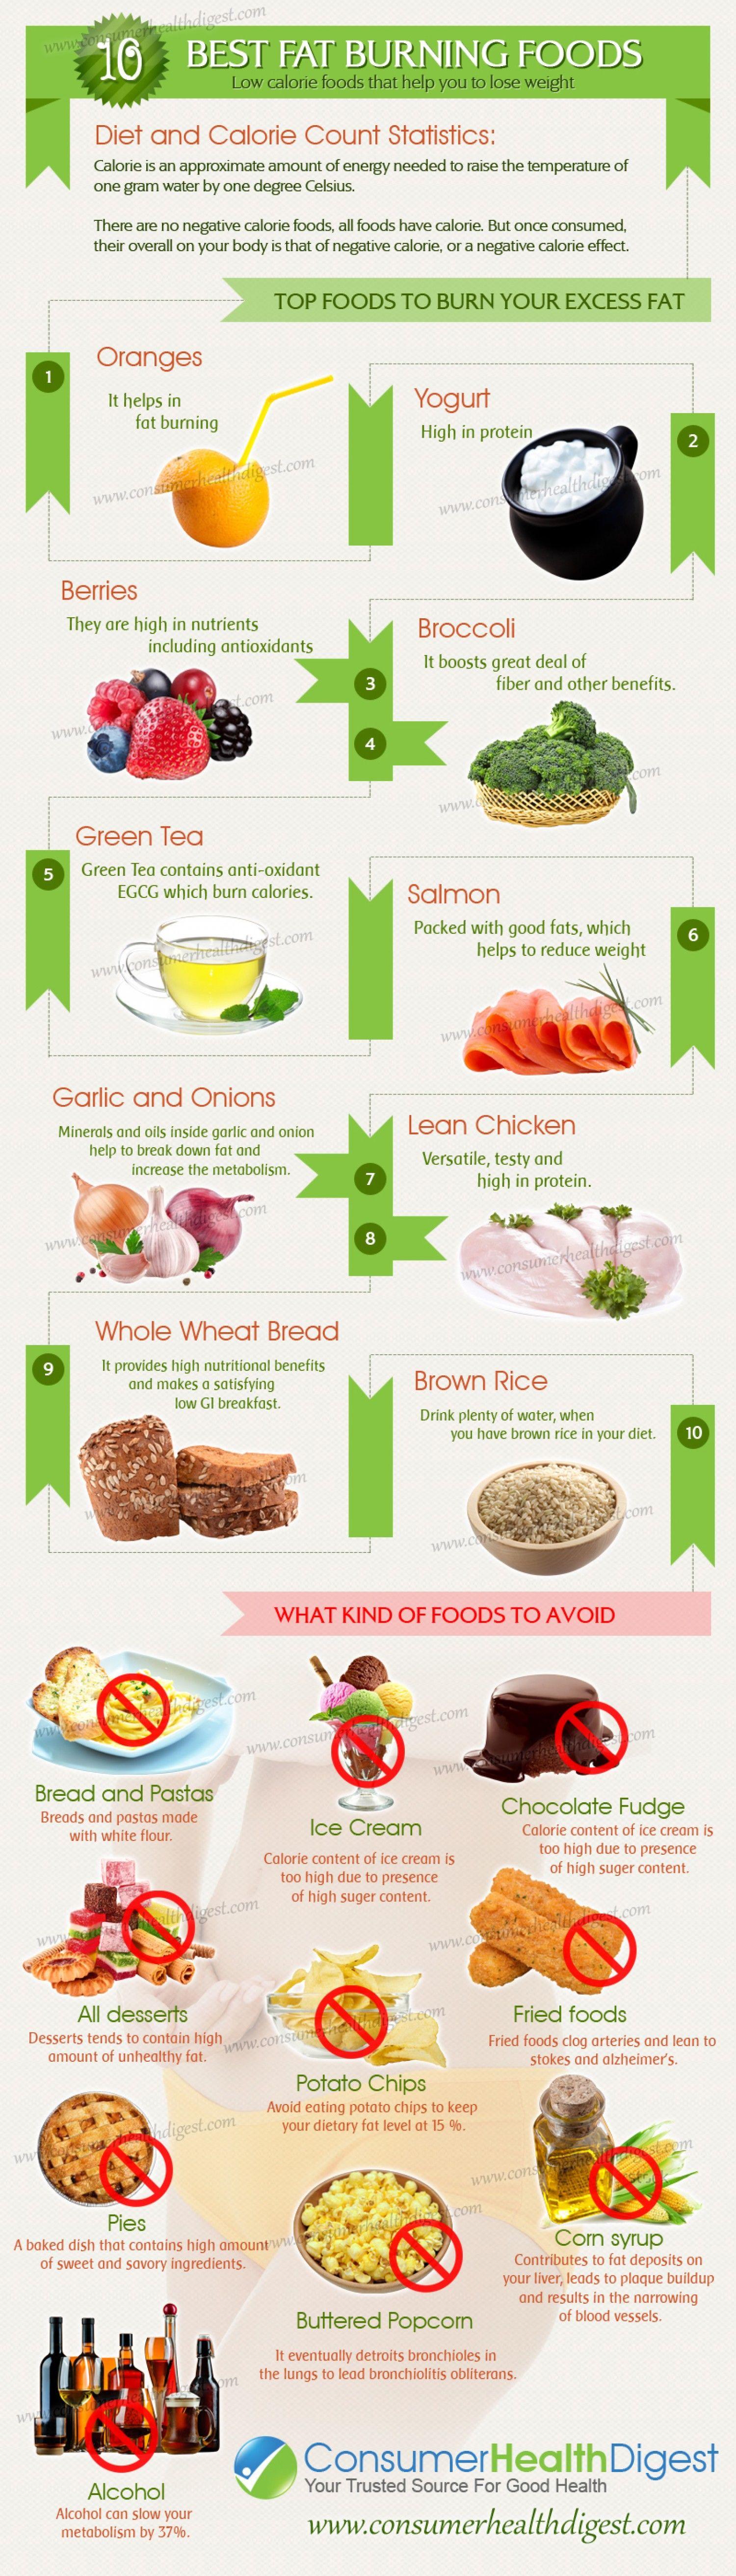 Best Fat Burning Foods